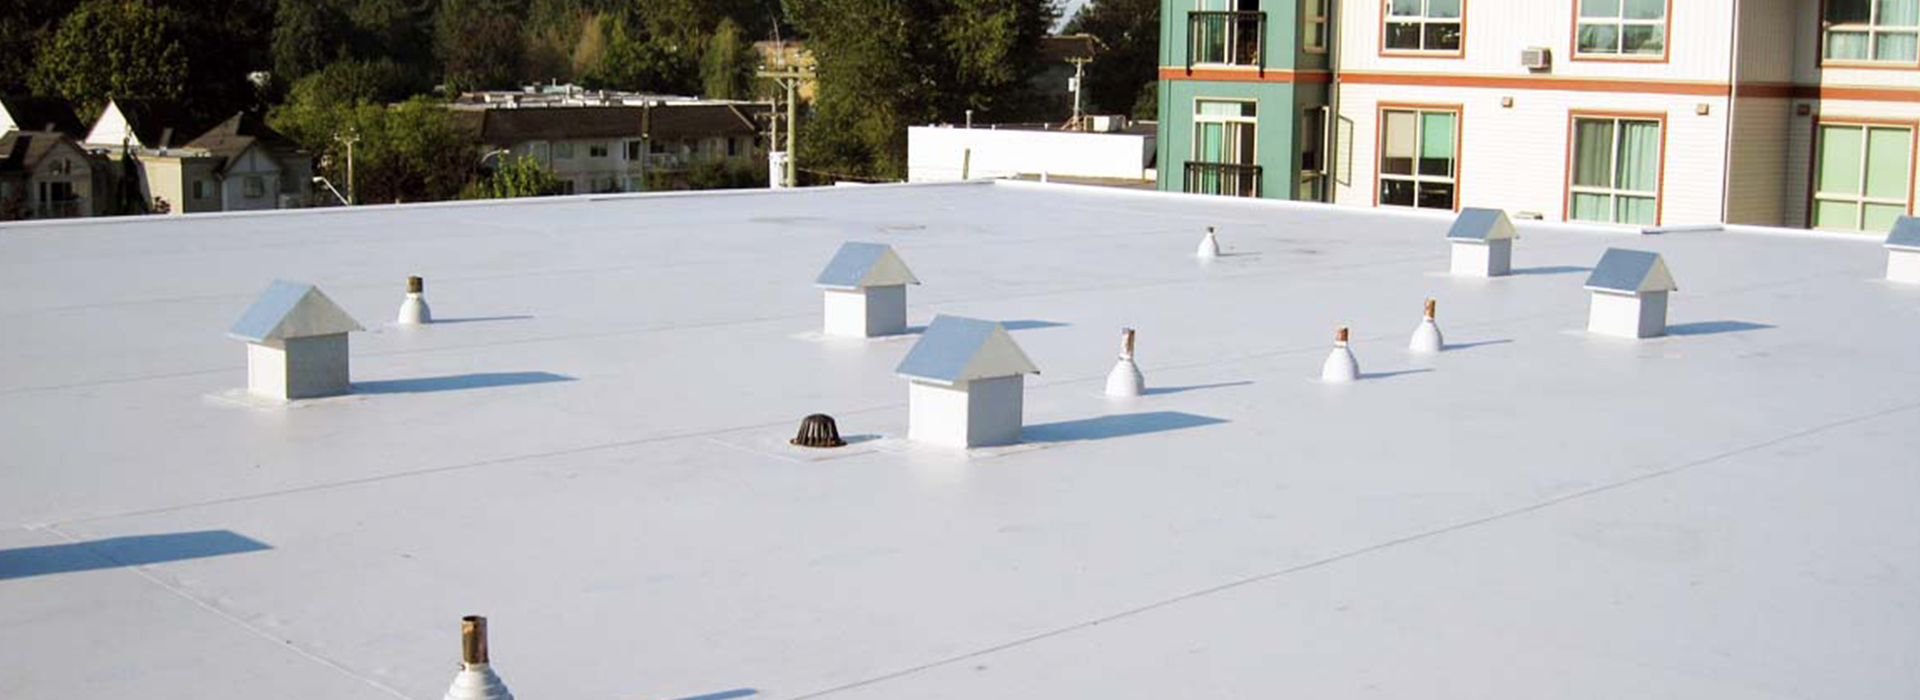 Home Neat Metal Roofing Inc Flat Roof Raleigh Nc Metal Roofing Raleigh Nc Metal Roofing Wake Forest Nc Metal Roofing Louisburg Nc Metal Roofing Clayton Nc Metal Roofing Wilsom Nc